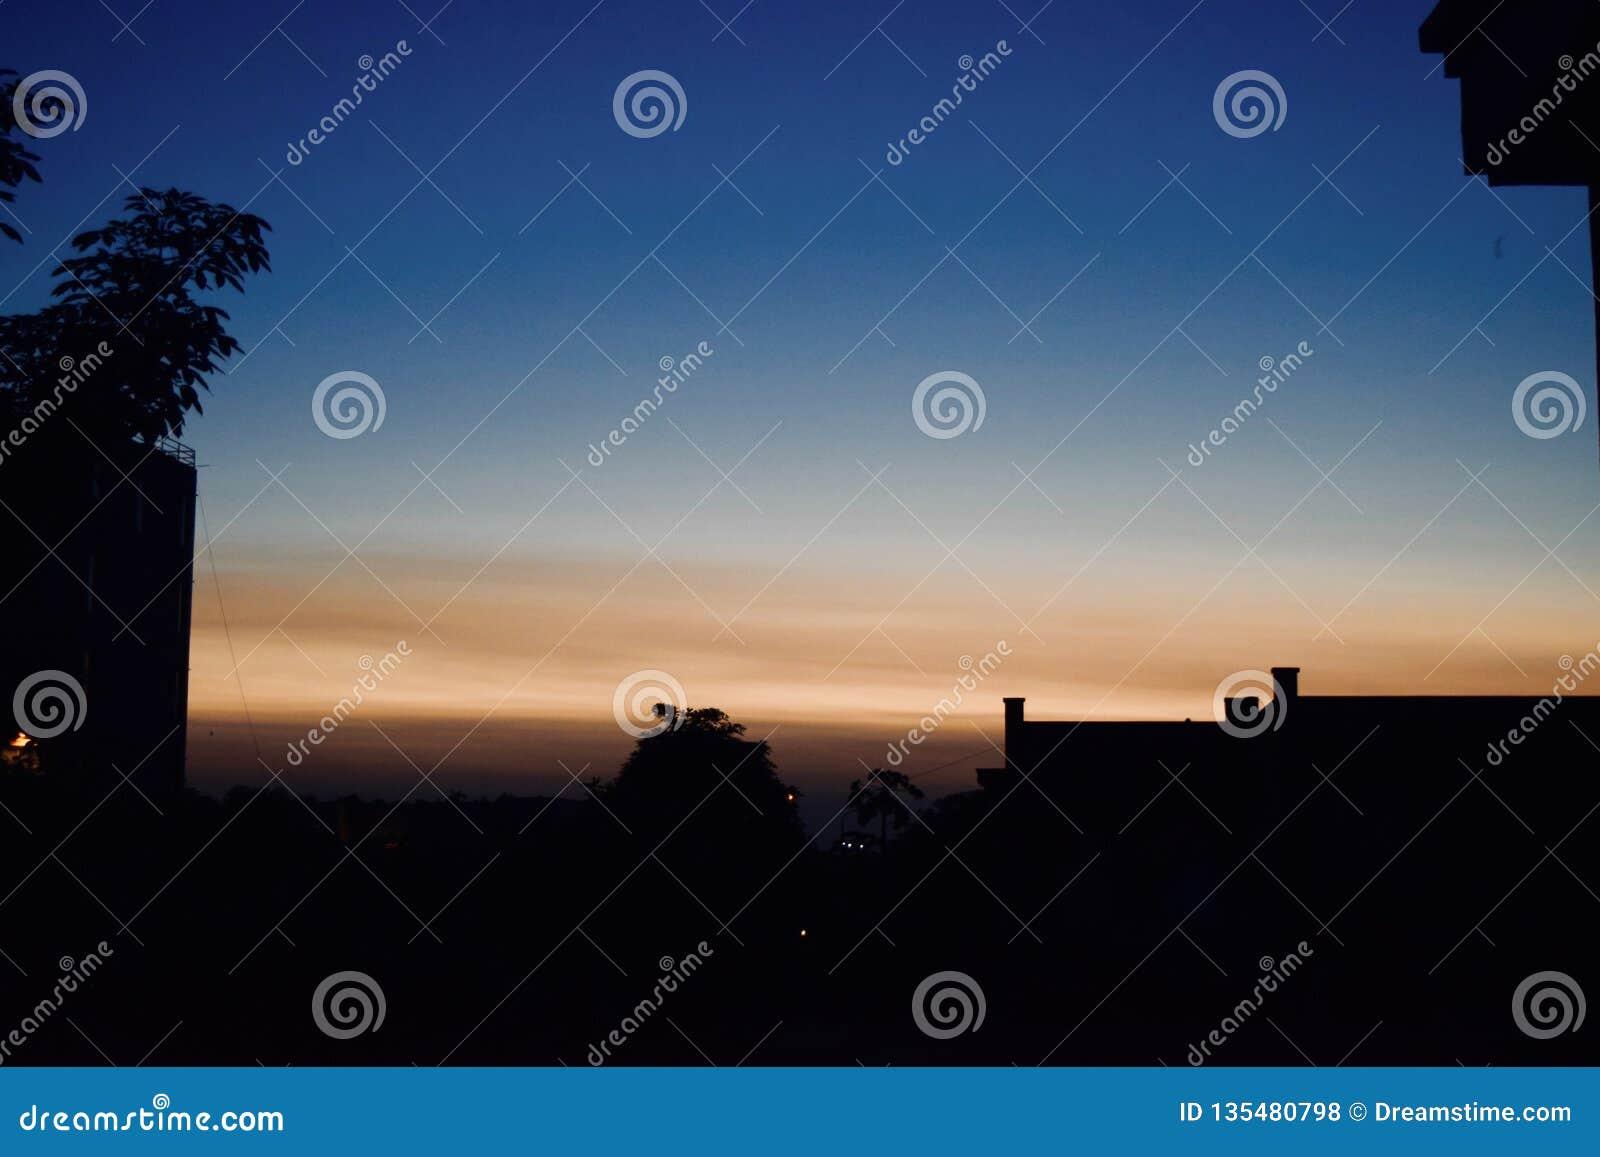 Beautiful view of a sunset